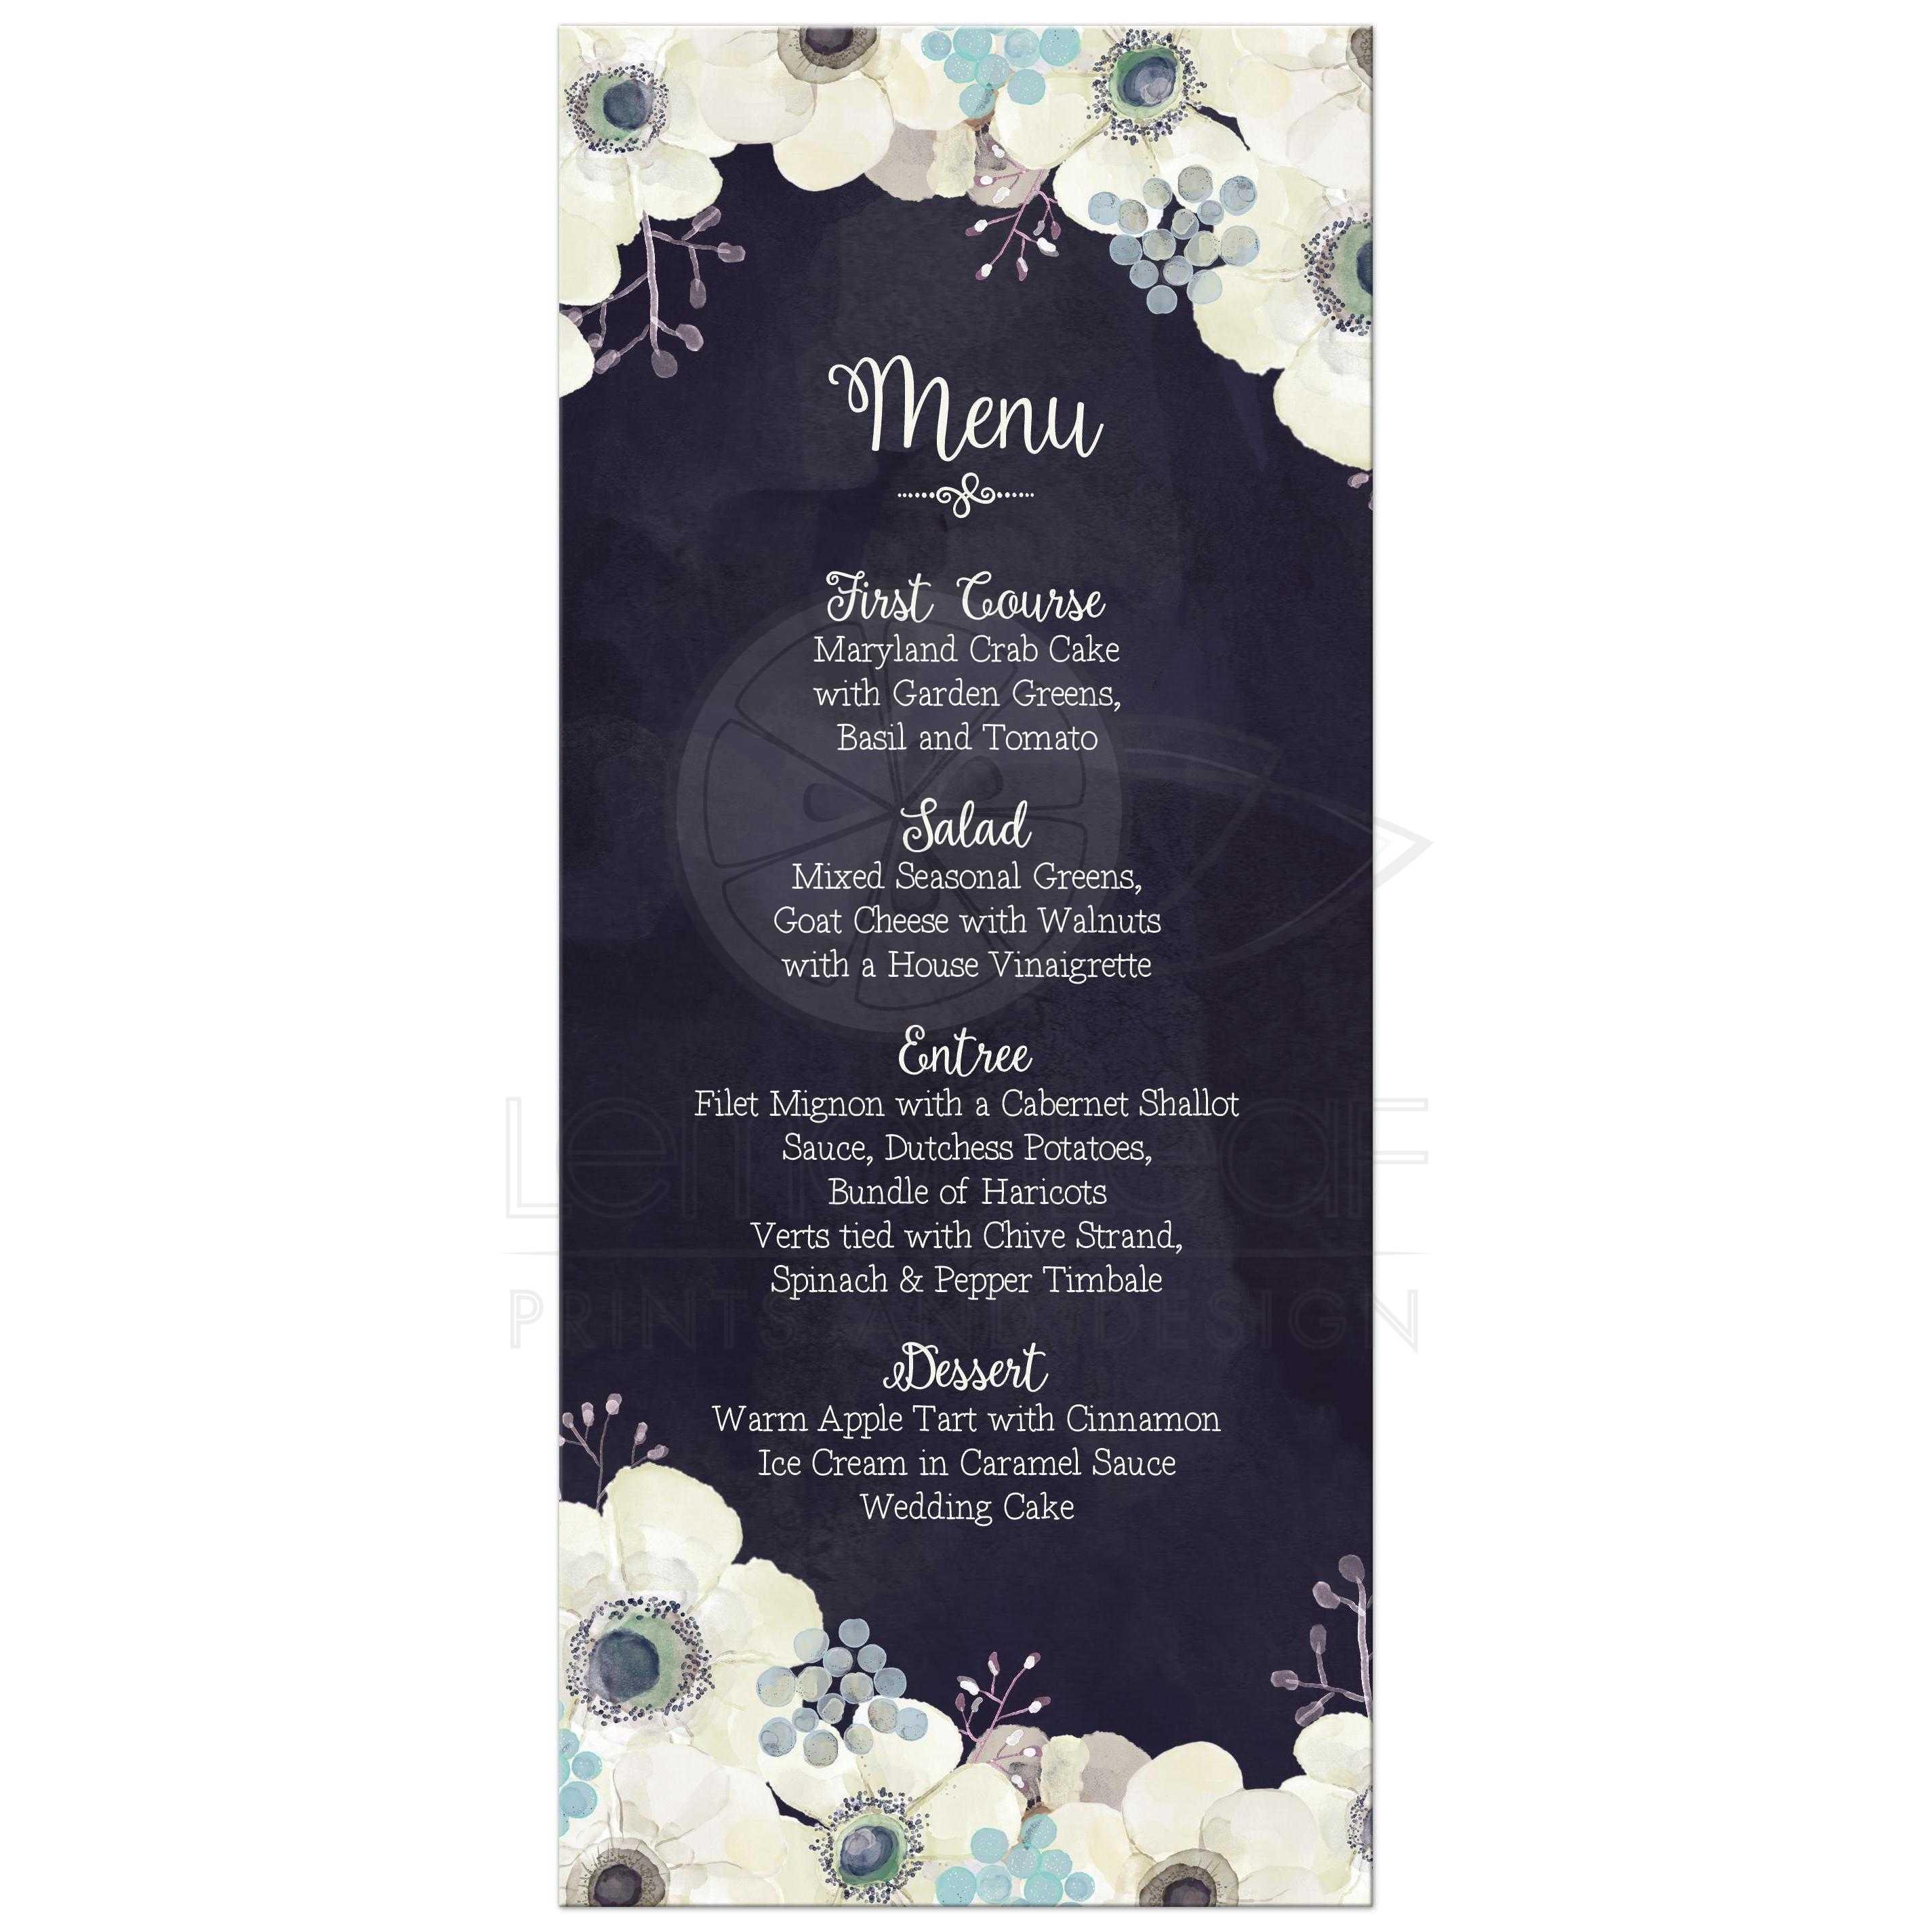 Wedding Food Menu - Watercolor Midnight Blue Purple Gray Flowers